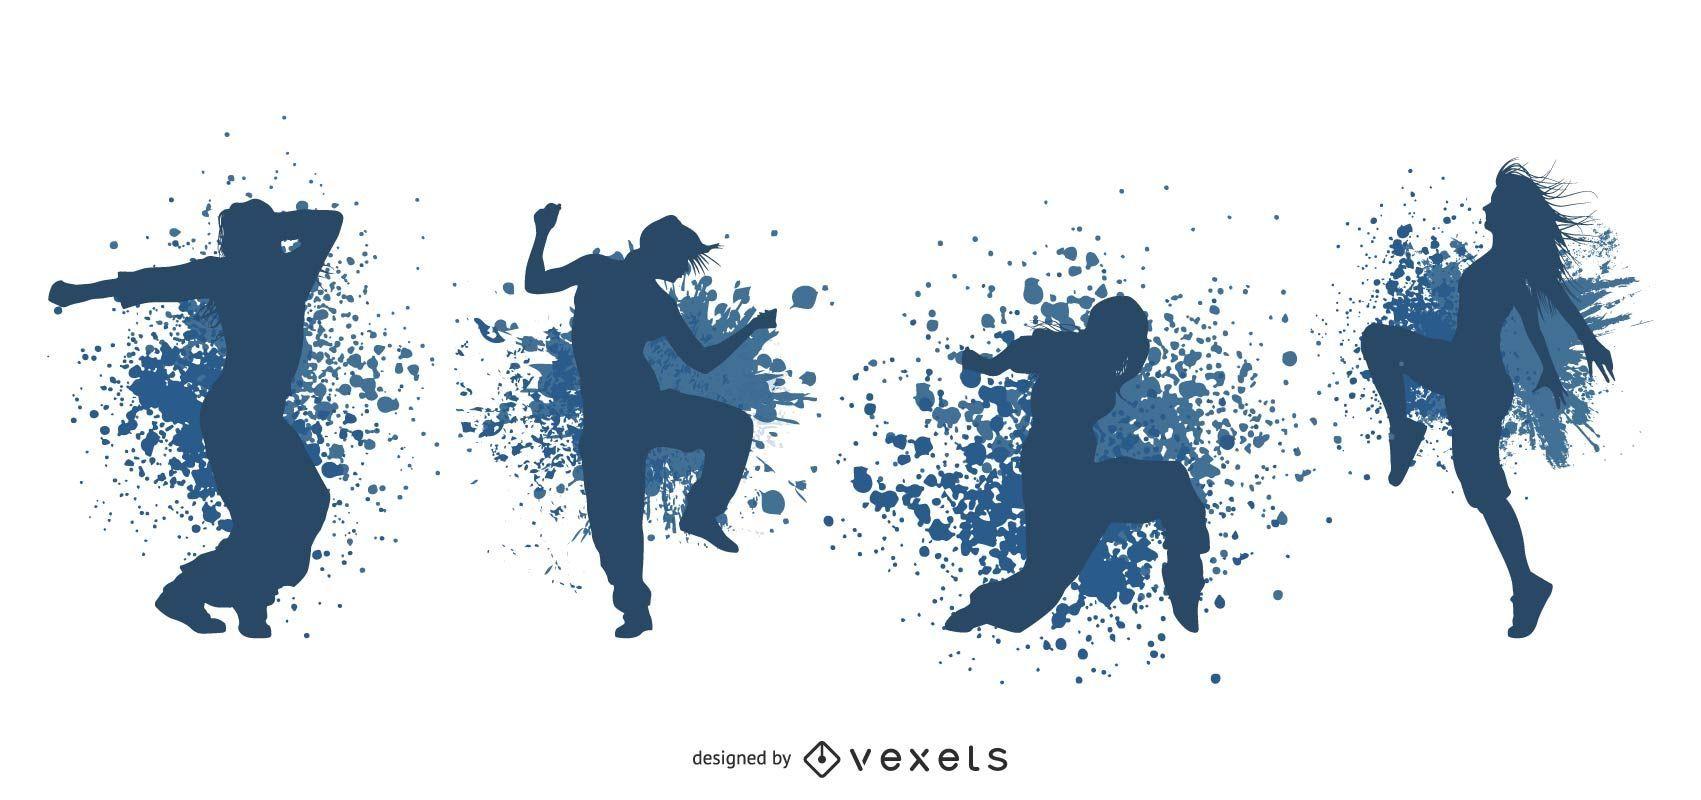 Grungy silueta bailando personas